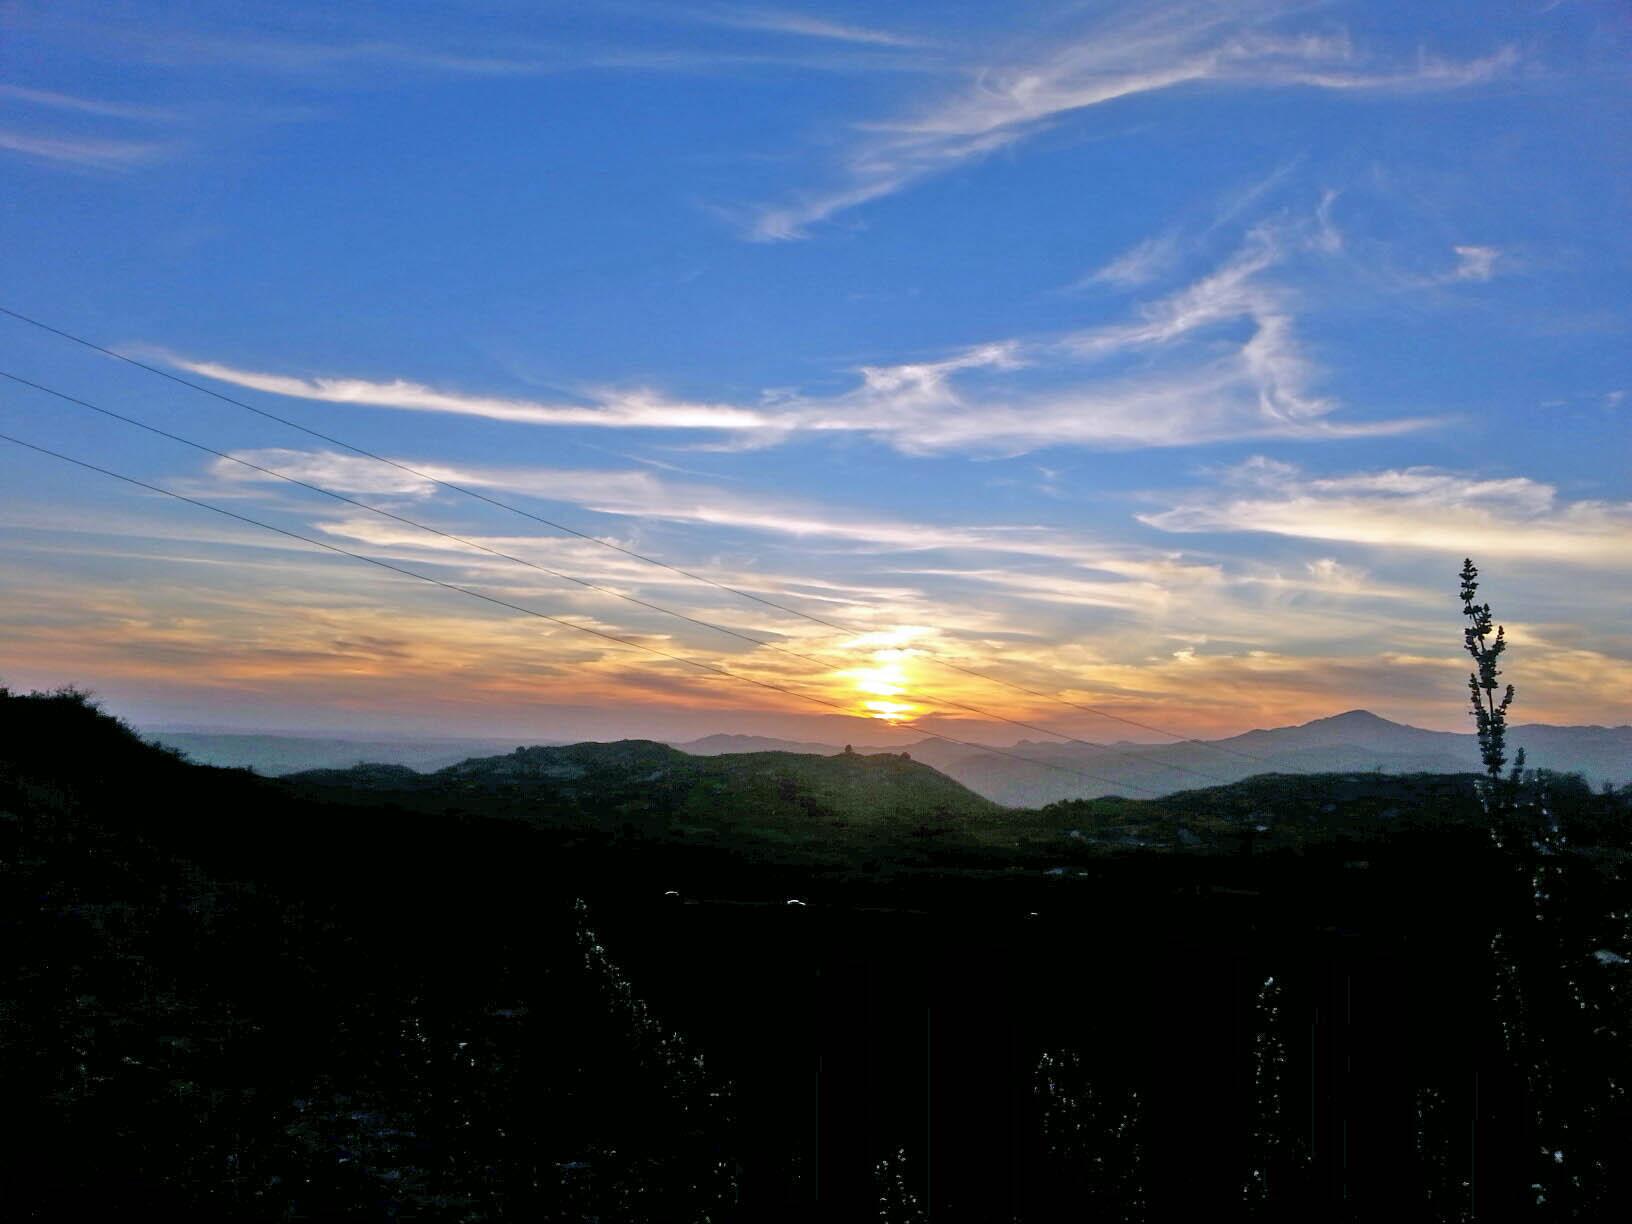 sunset-at-blue-sky-ranch.jpg